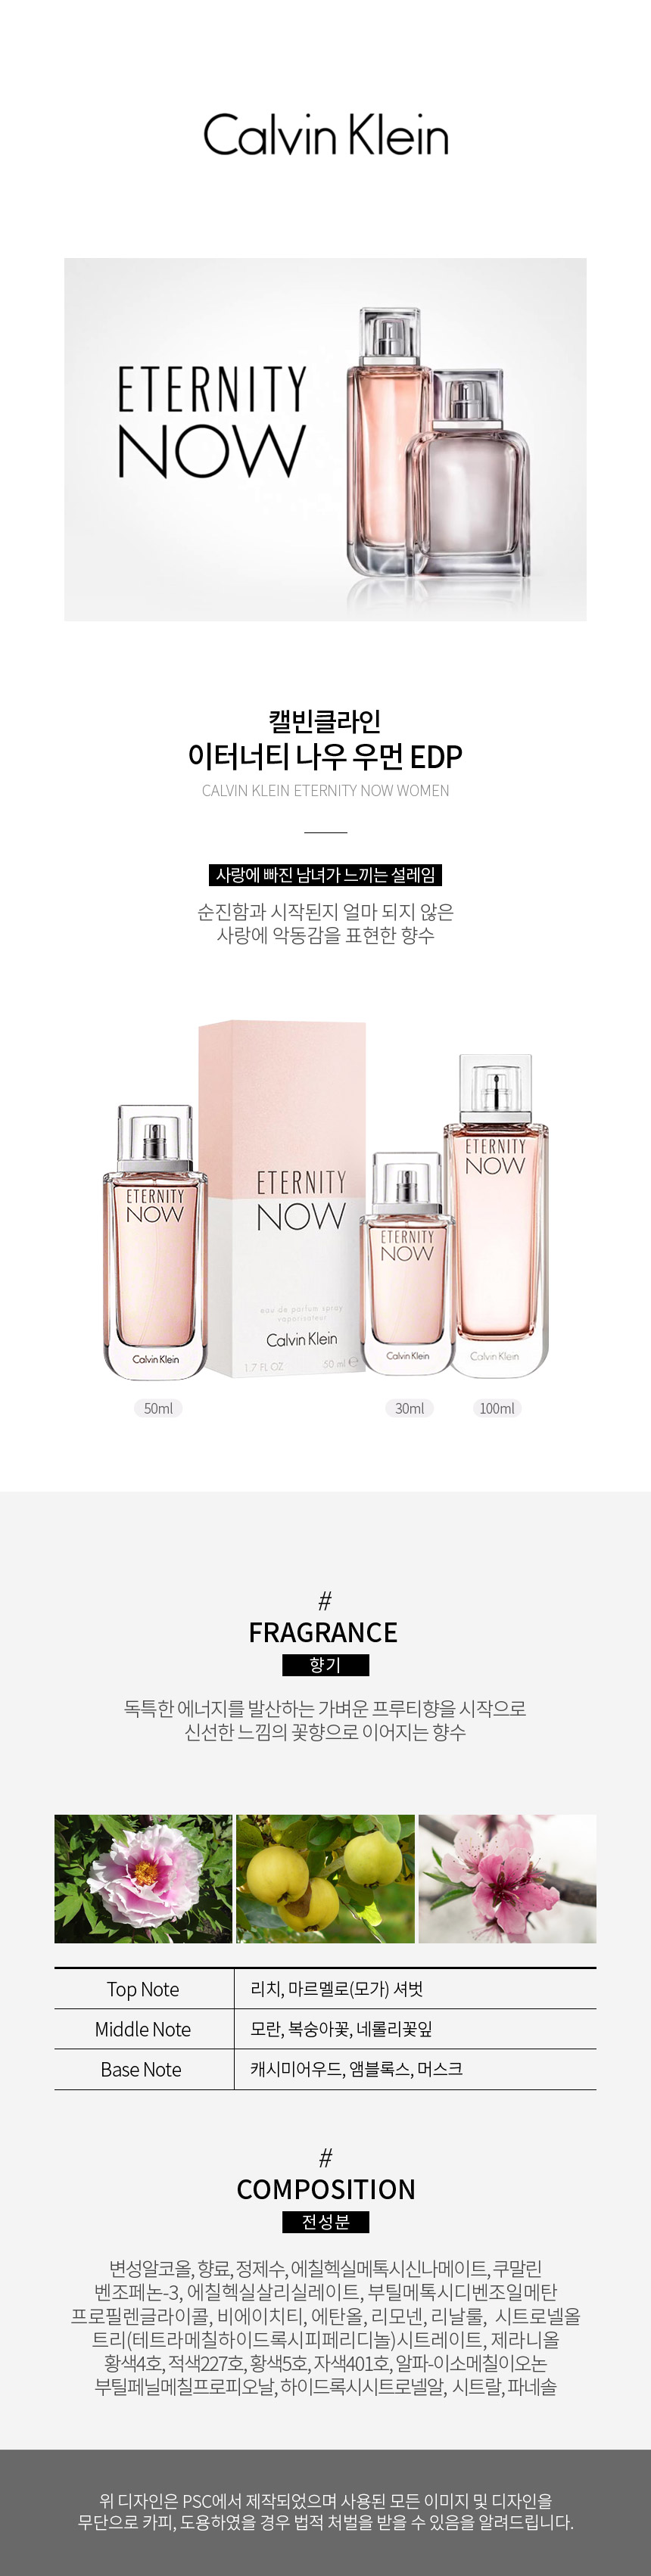 calvinklein_eternity_nowwomen_page.jpg